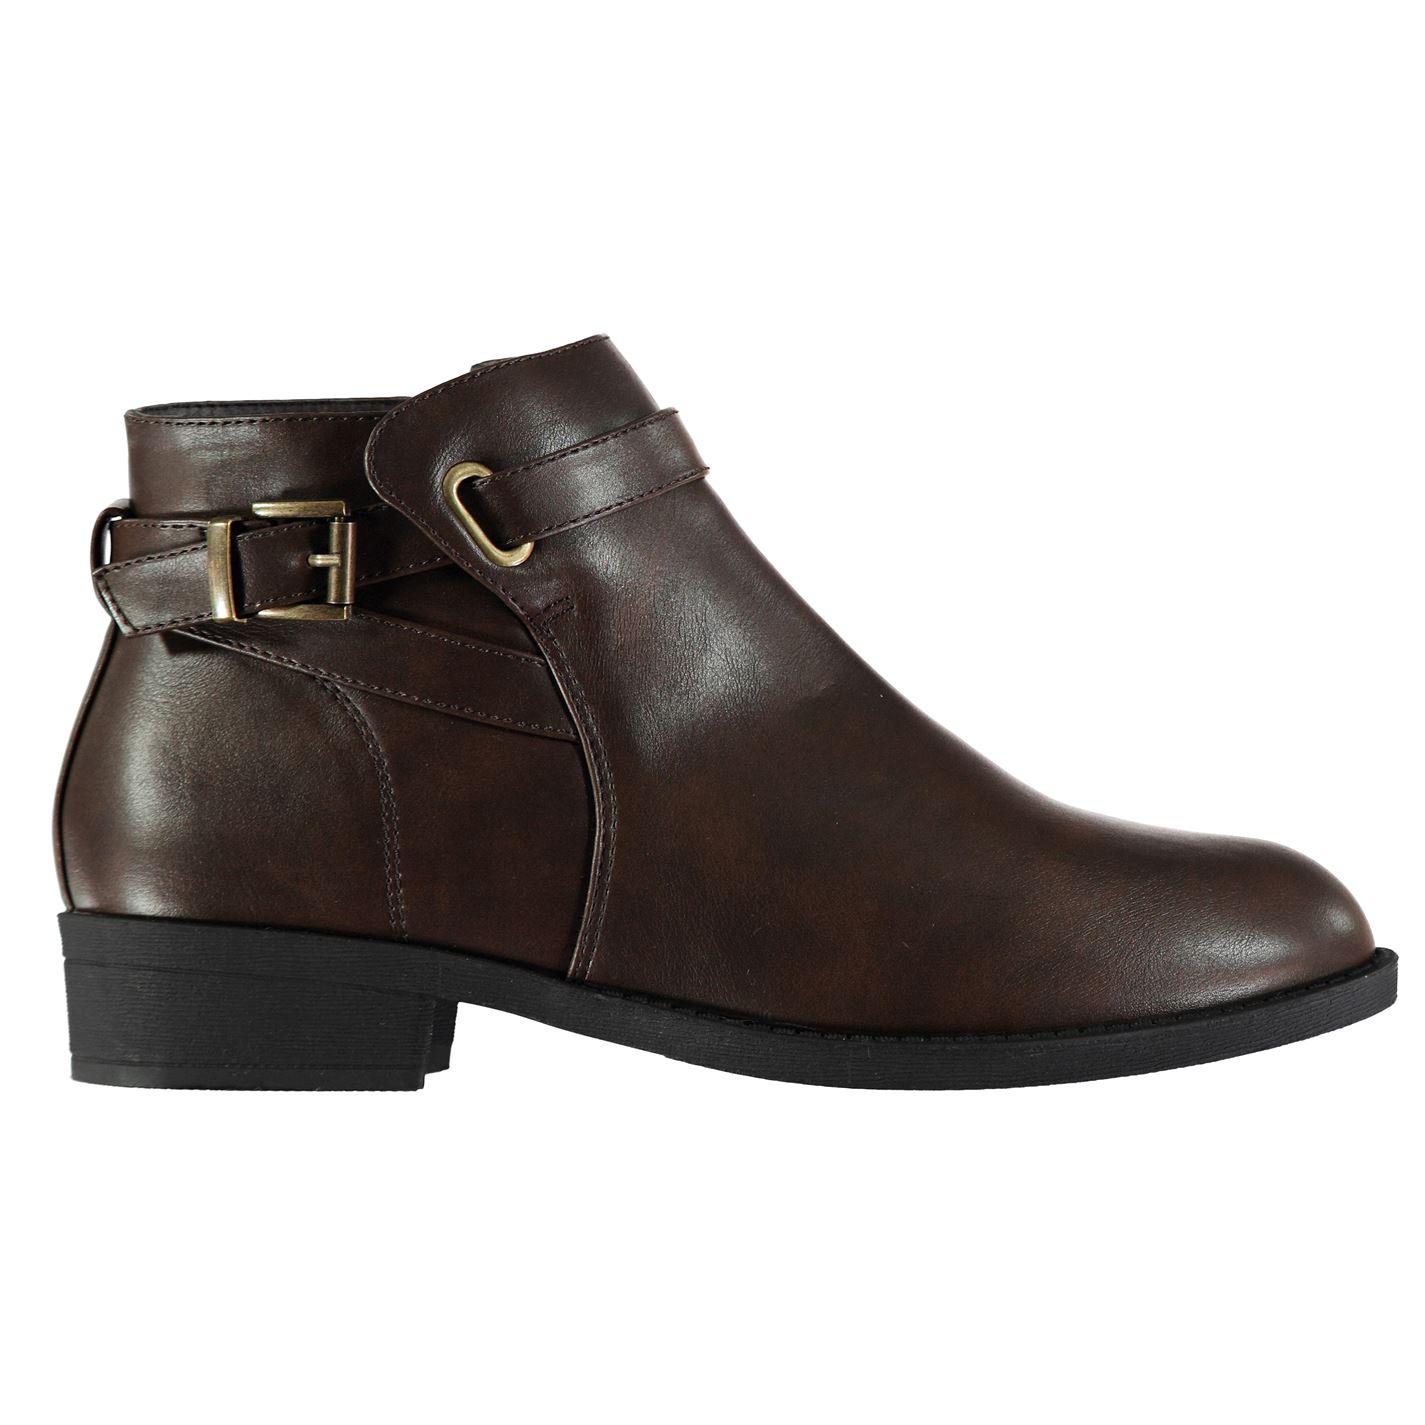 Women's boots Miso Buckle